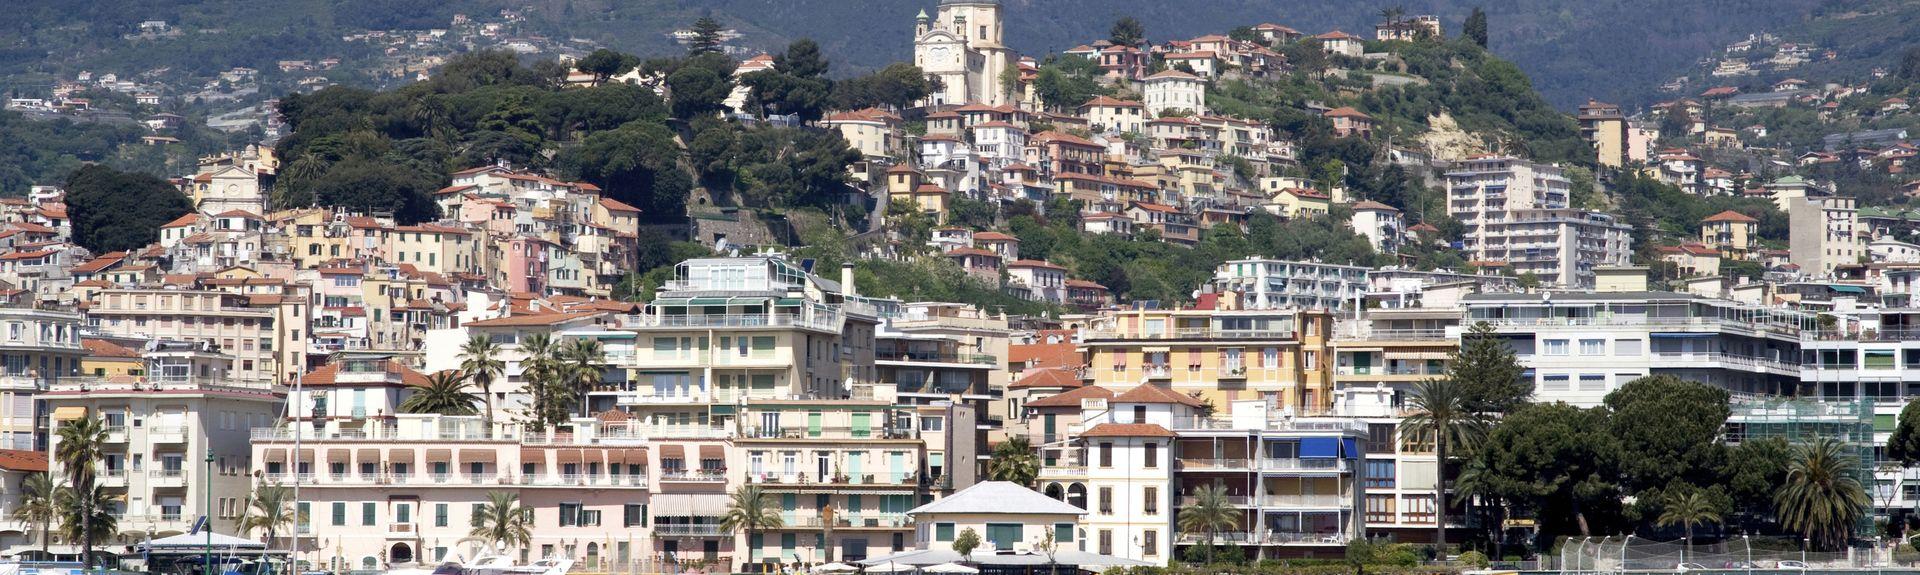 Sanremo, Liguria, Italy